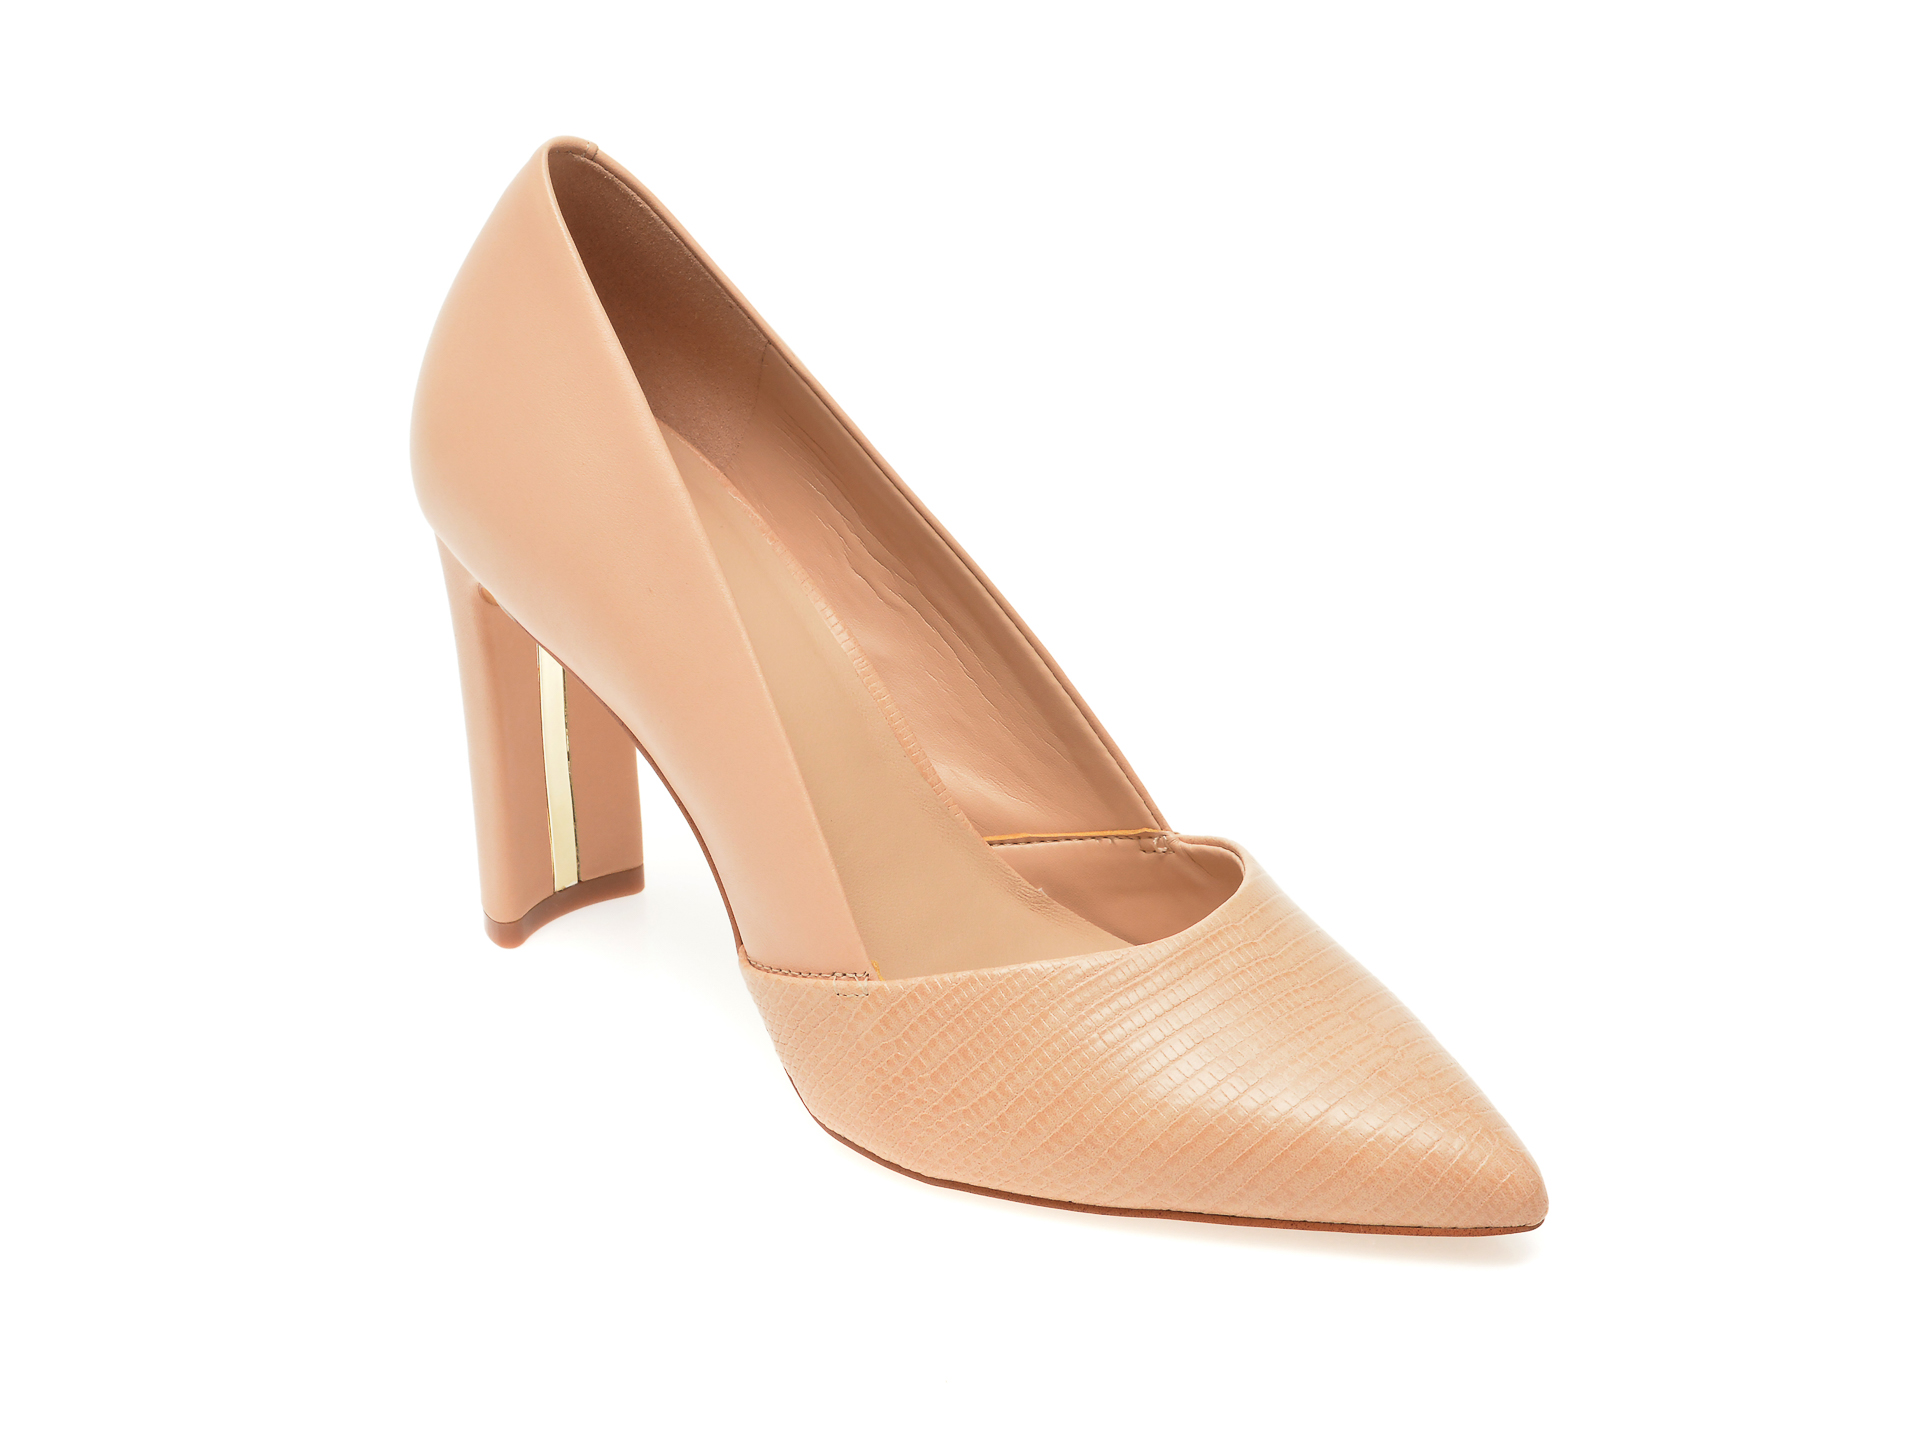 Pantofi ALDO nude, Adworen270, din piele naturala imagine otter.ro 2021